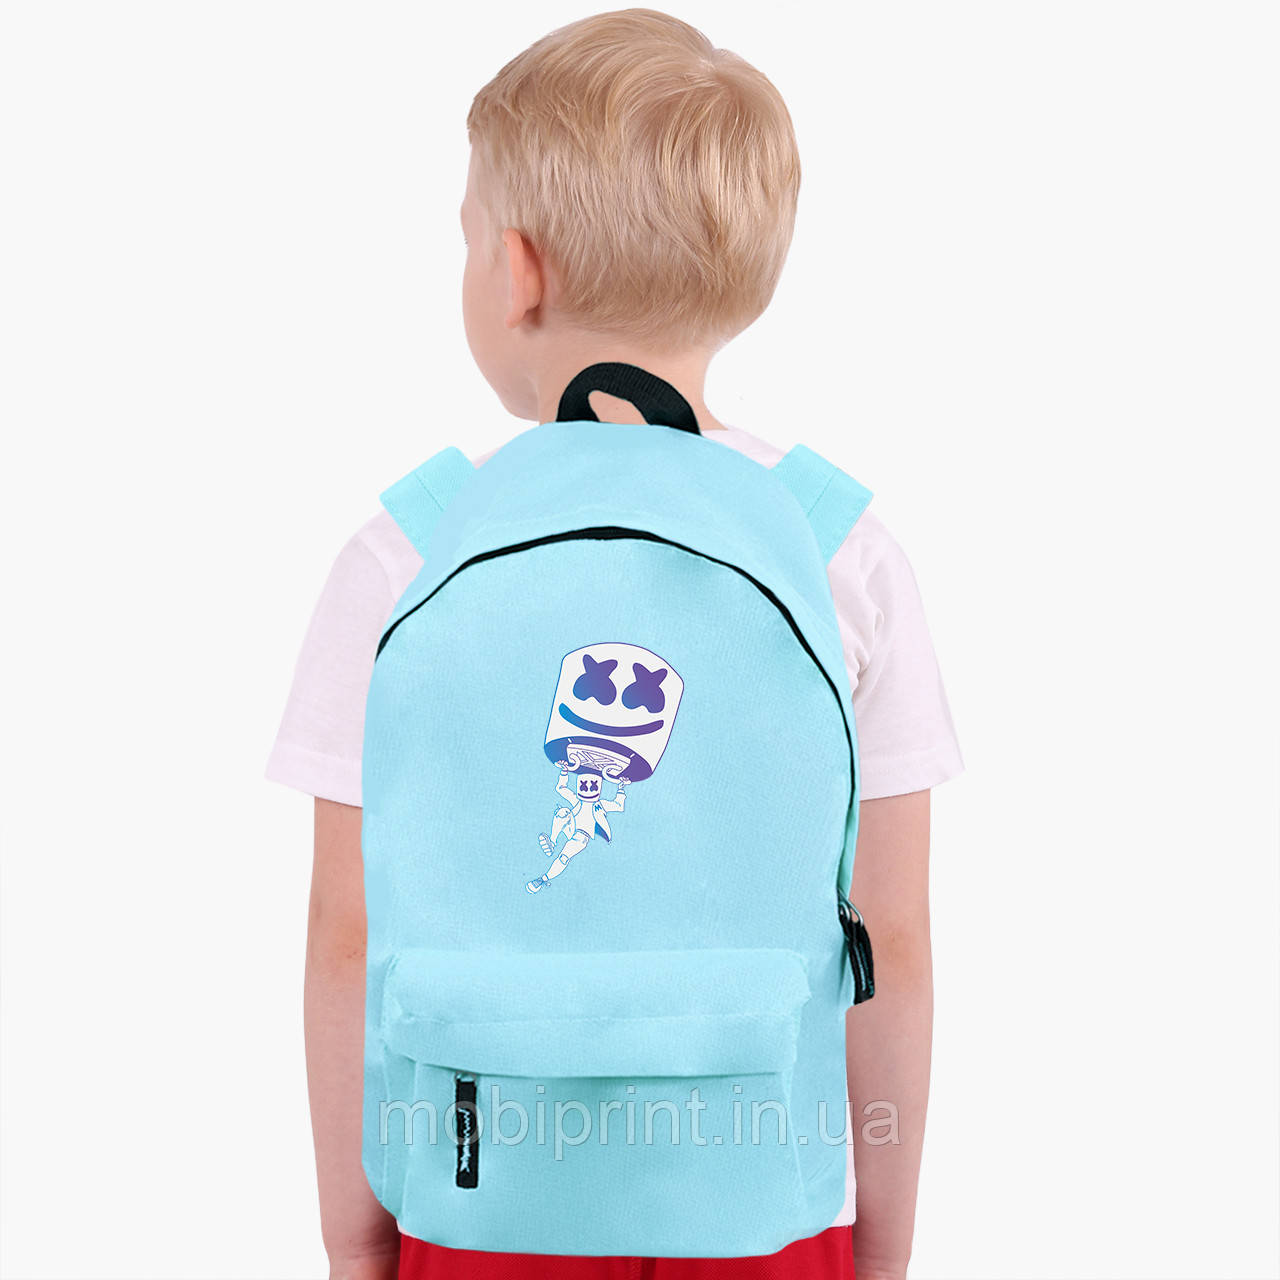 Дитячий рюкзак Маршмелло Фортнайт (Marshmello Fortnite) (9263-1329)